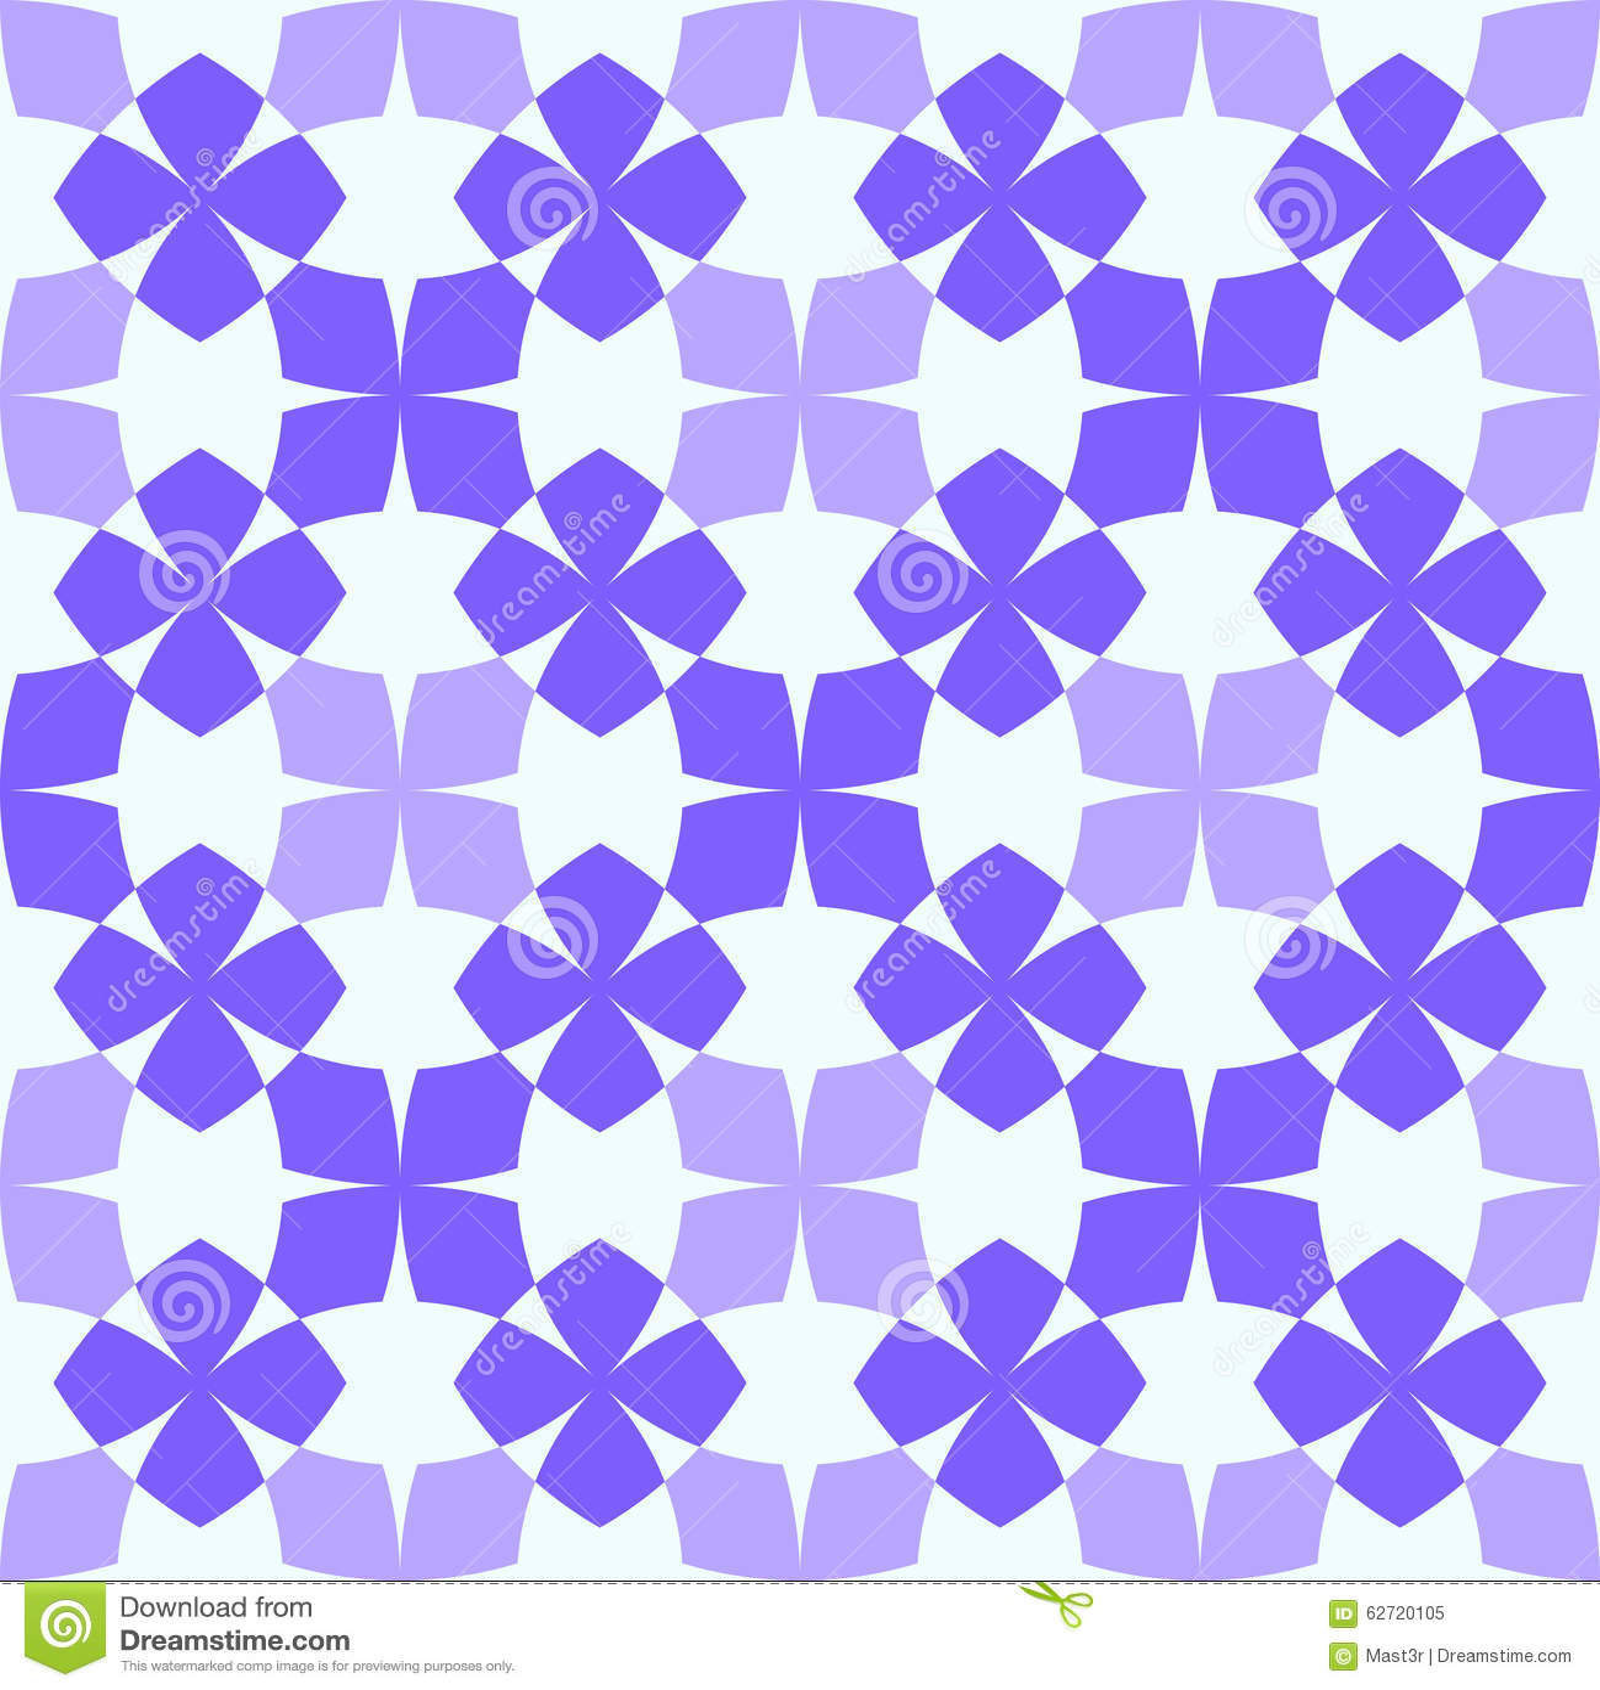 Download Γεωμετρικό αφηρημένο άνευ ραφής σχέδιο ζωηρόχρωμο Διανυσματική απεικόνιση - εικονογραφία από ύφασμα, μωσαϊκό: 62720105